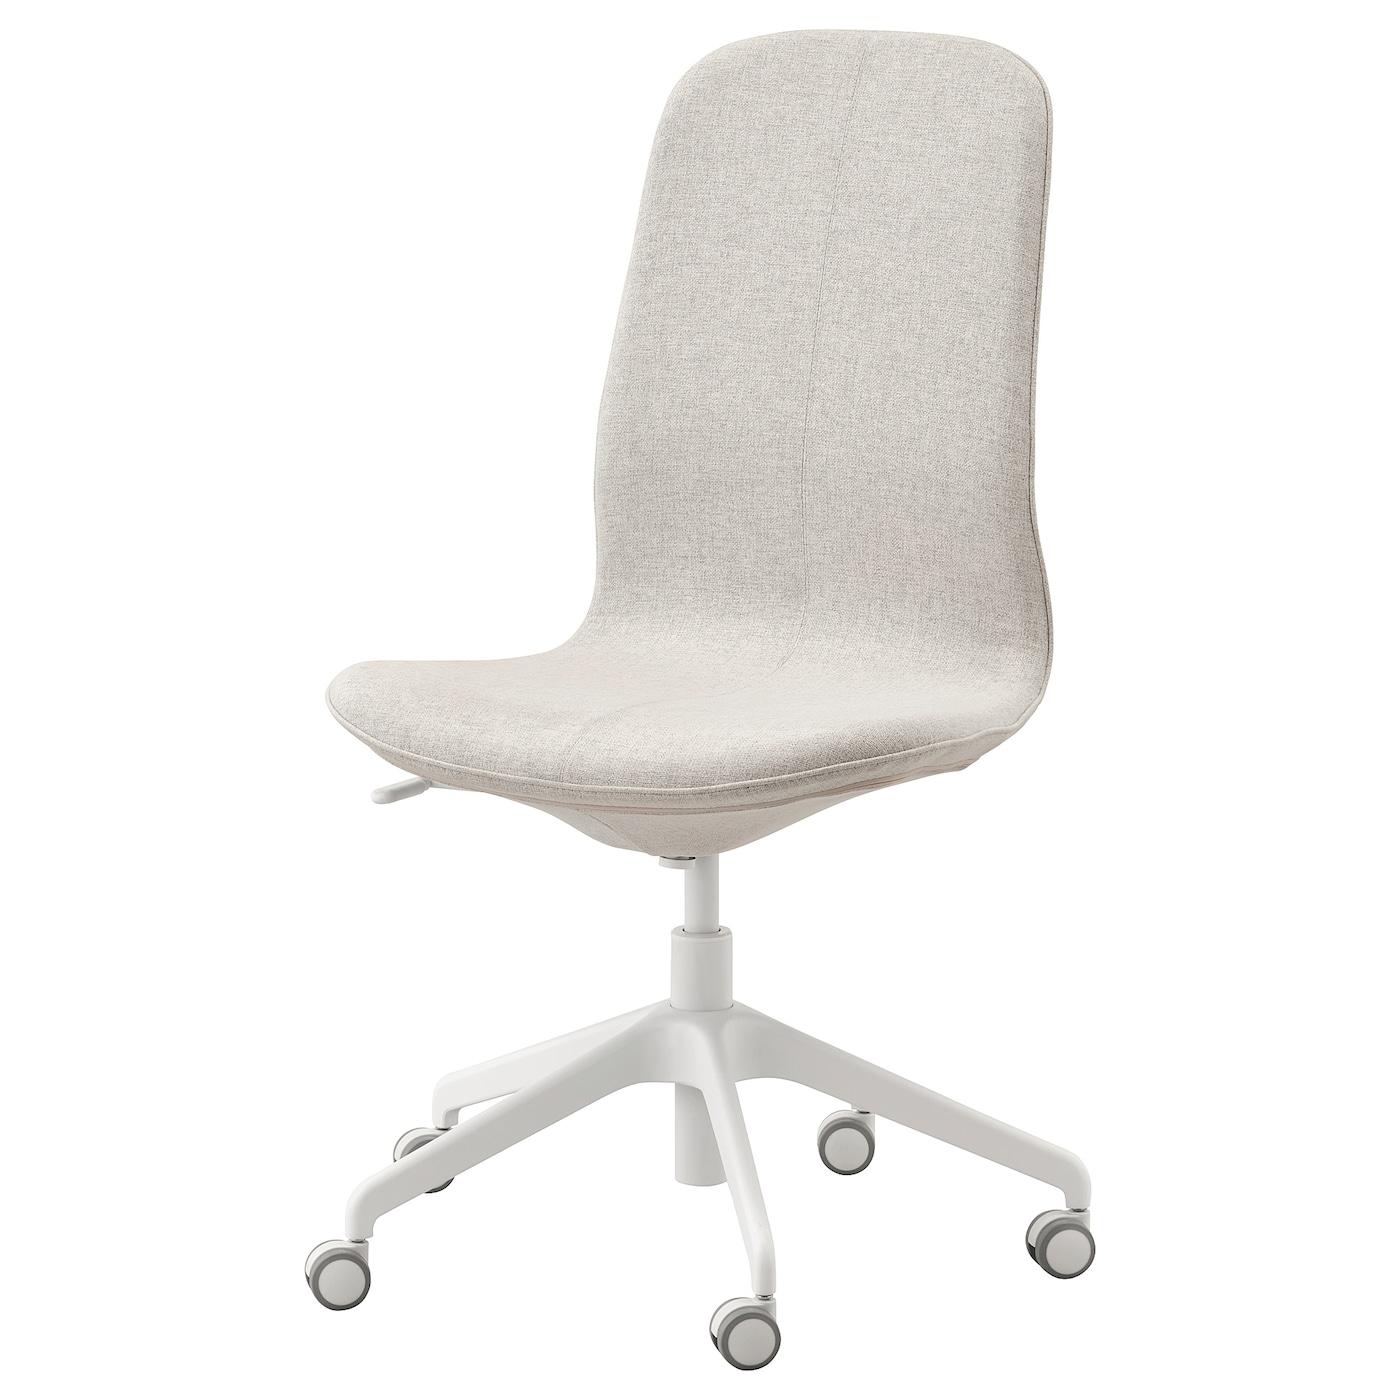 LÅNGFJÄLL Office chair - Gunnared beige/white